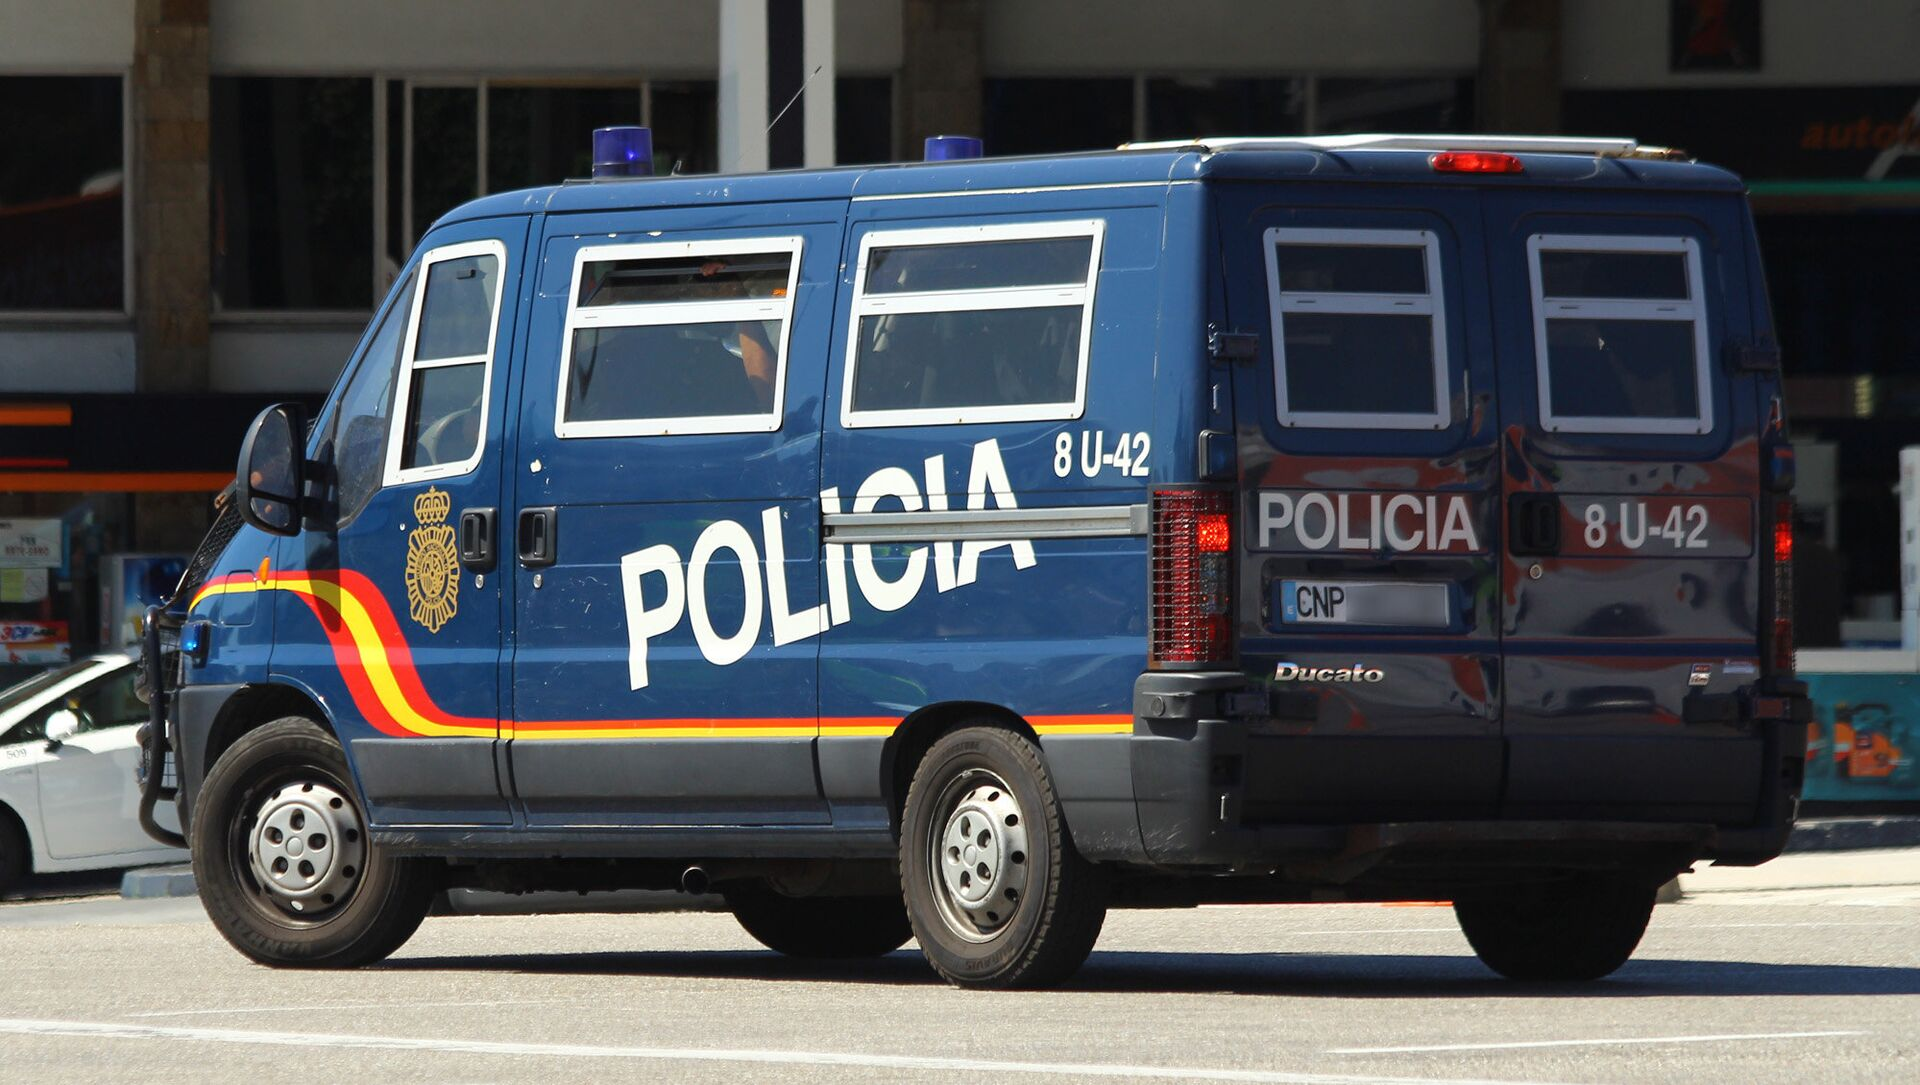 Policía Nacional de España (archivo) - Sputnik Italia, 1920, 27.04.2021